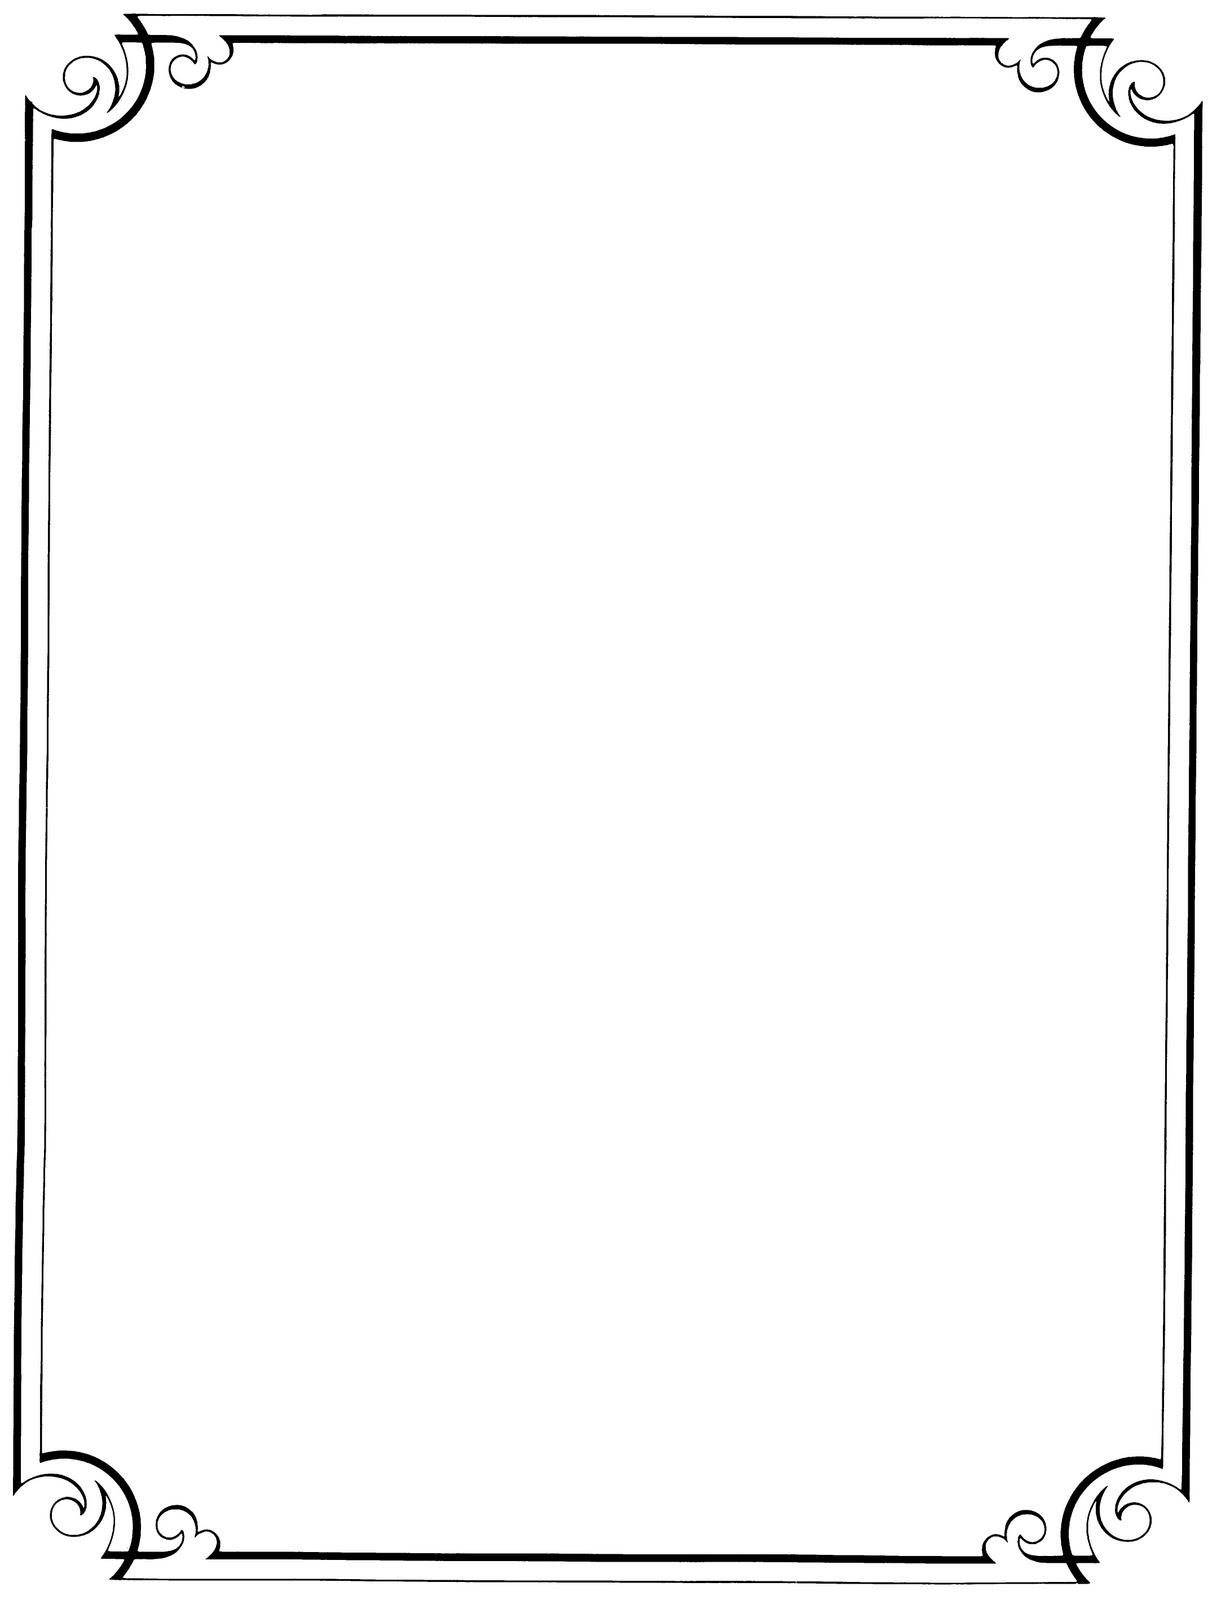 Frame victorian scroll.